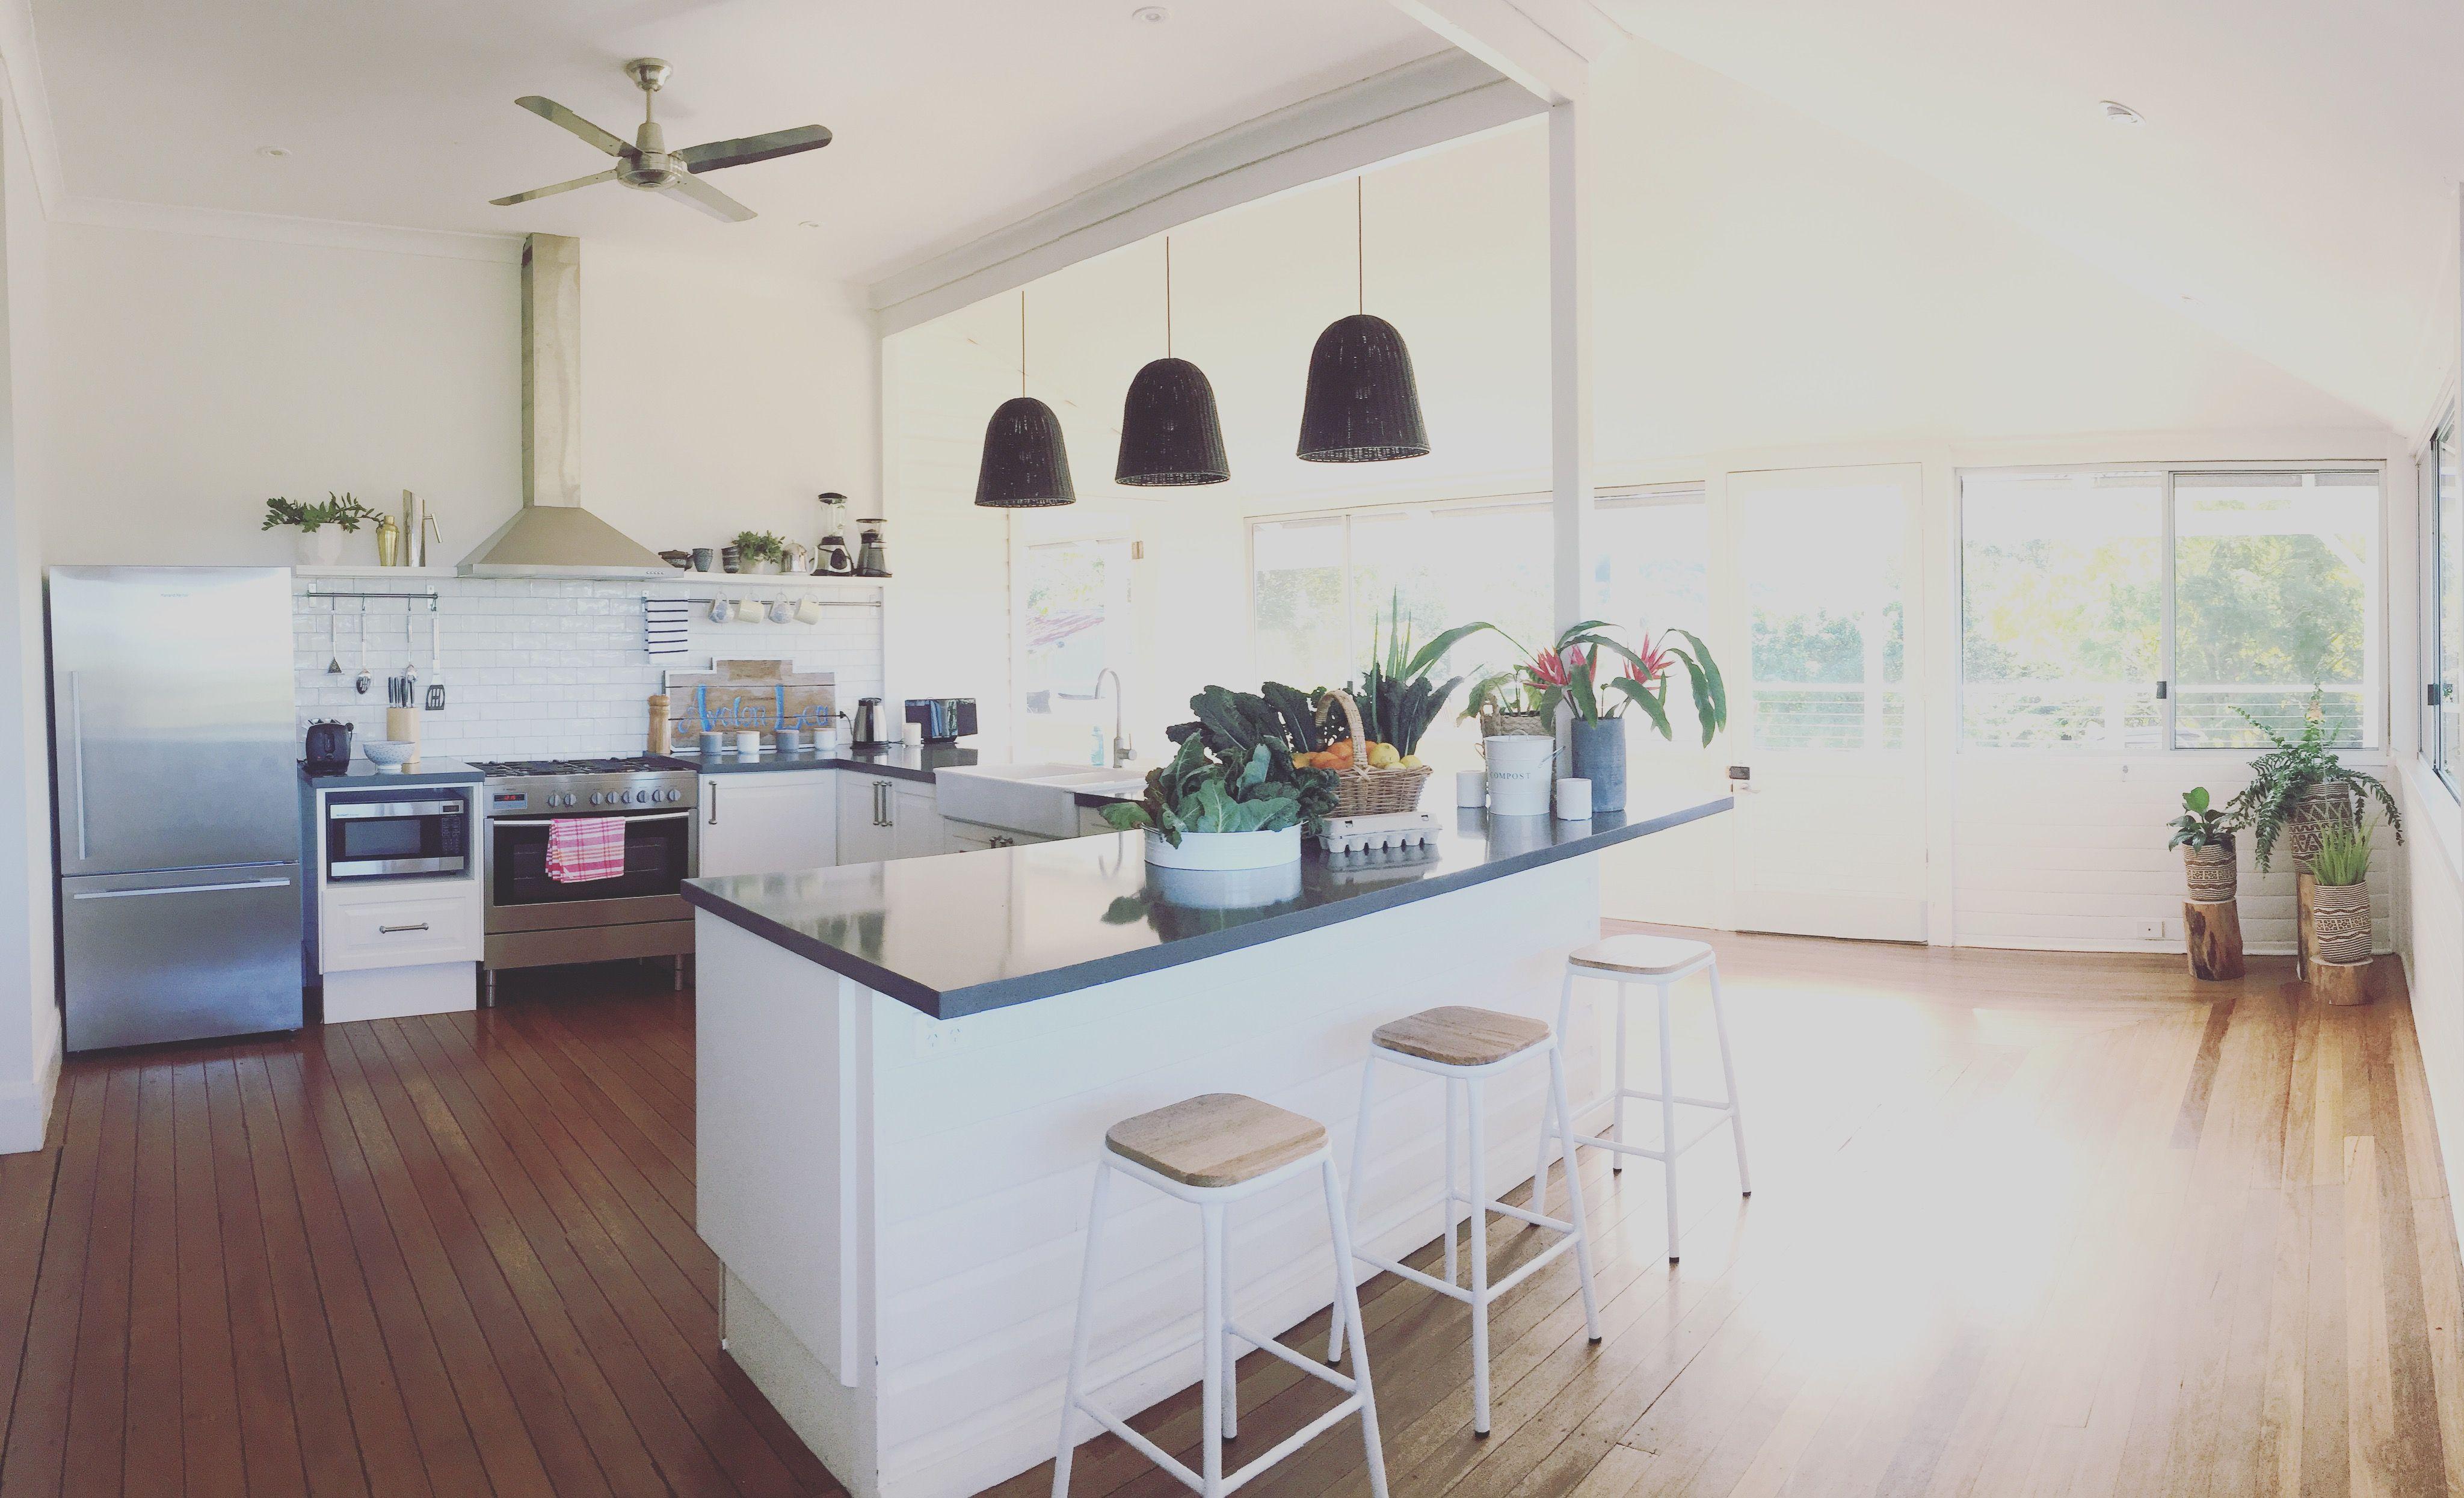 Contemporary Homestead Kitchen Gift - Kitchen Cabinets | Ideas ...